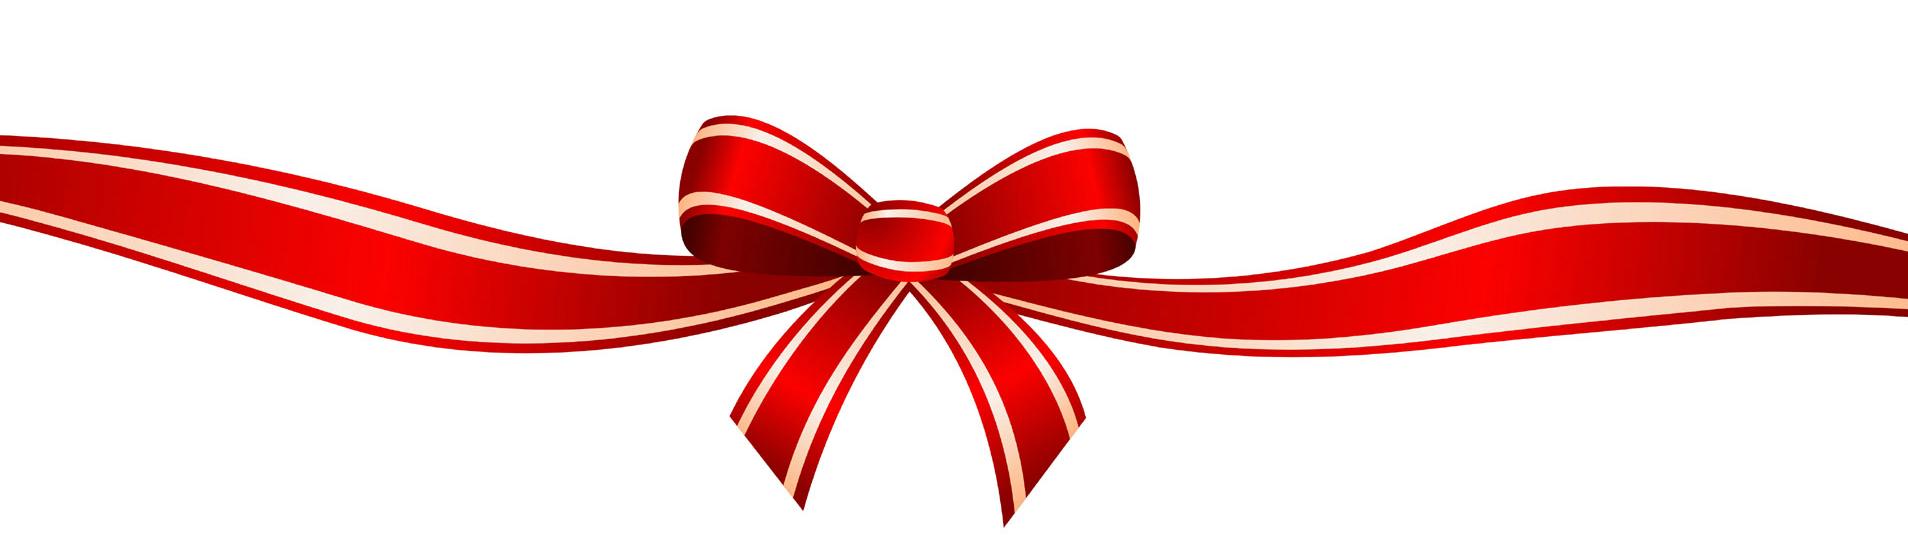 Christmas Header Clipart.8 Christmas Ribbon Clip Art Clipartlook